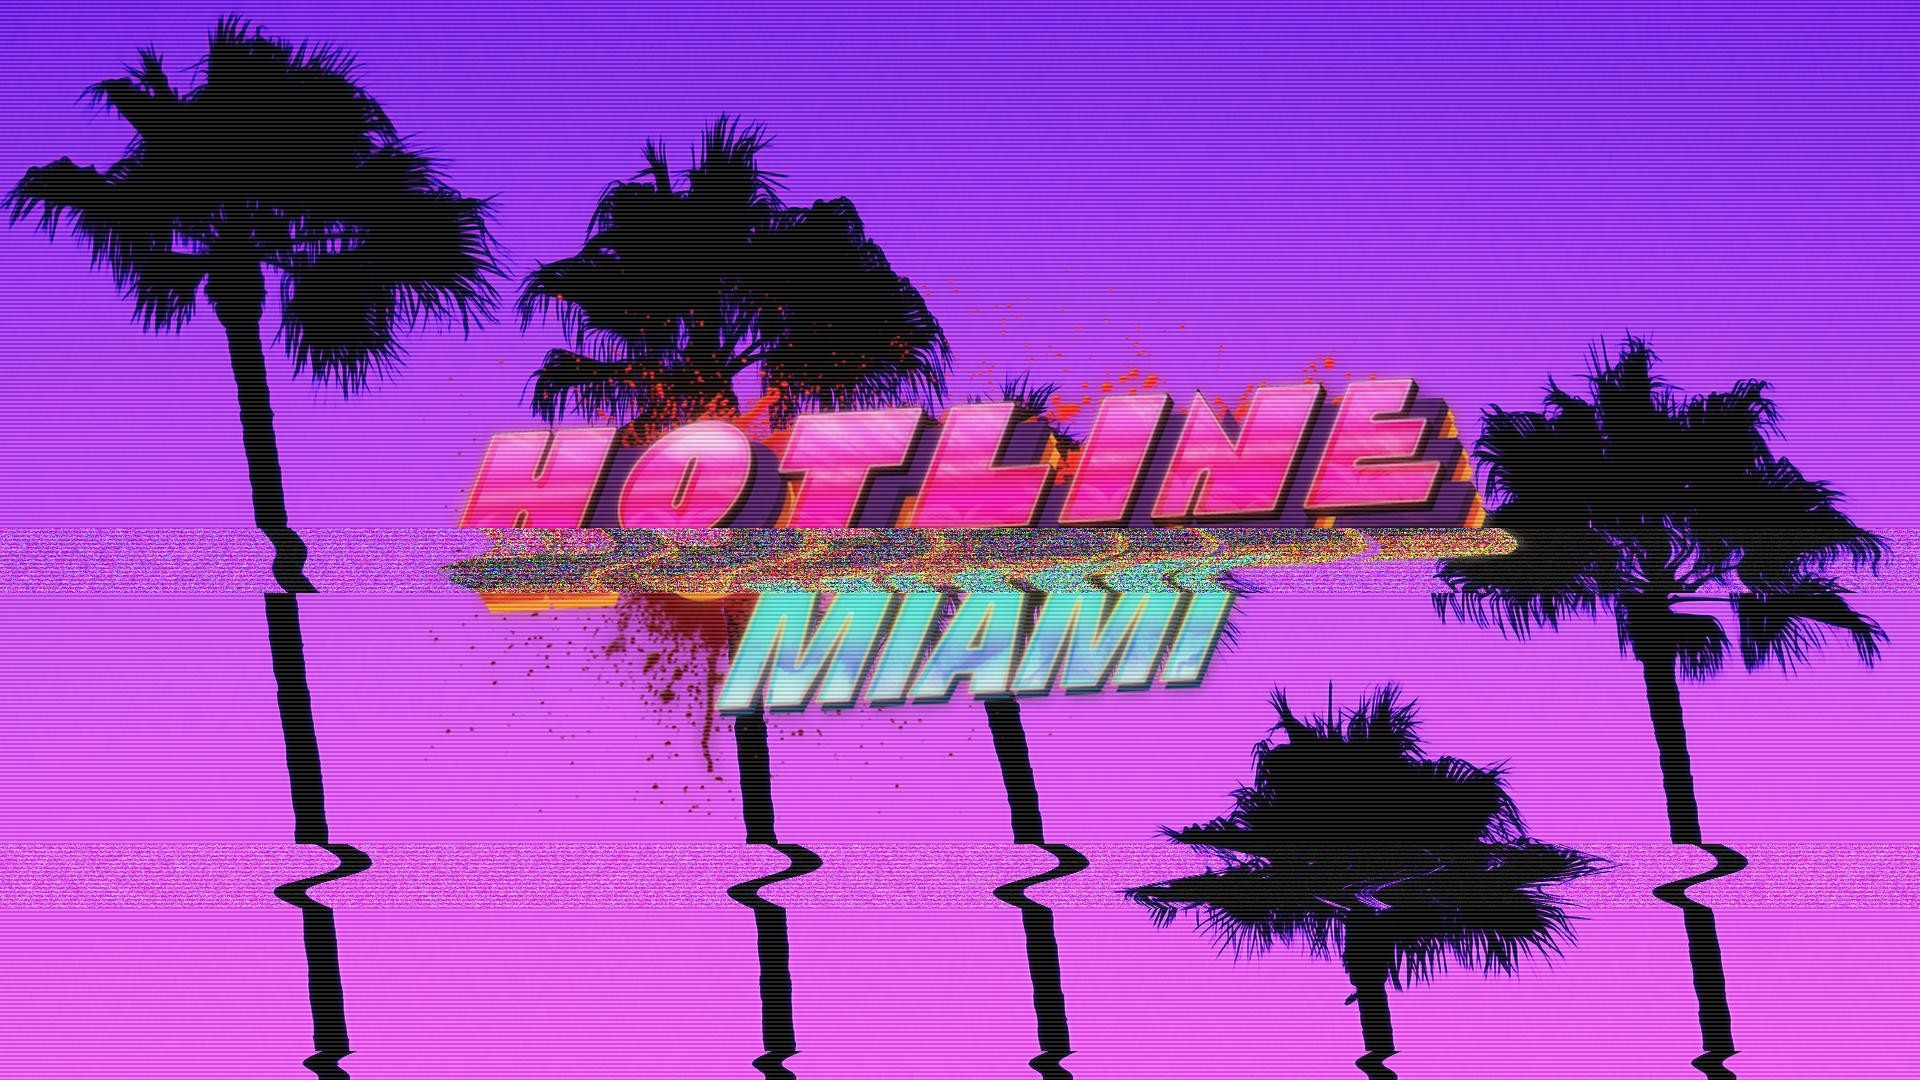 Hotline Miami wallpapers